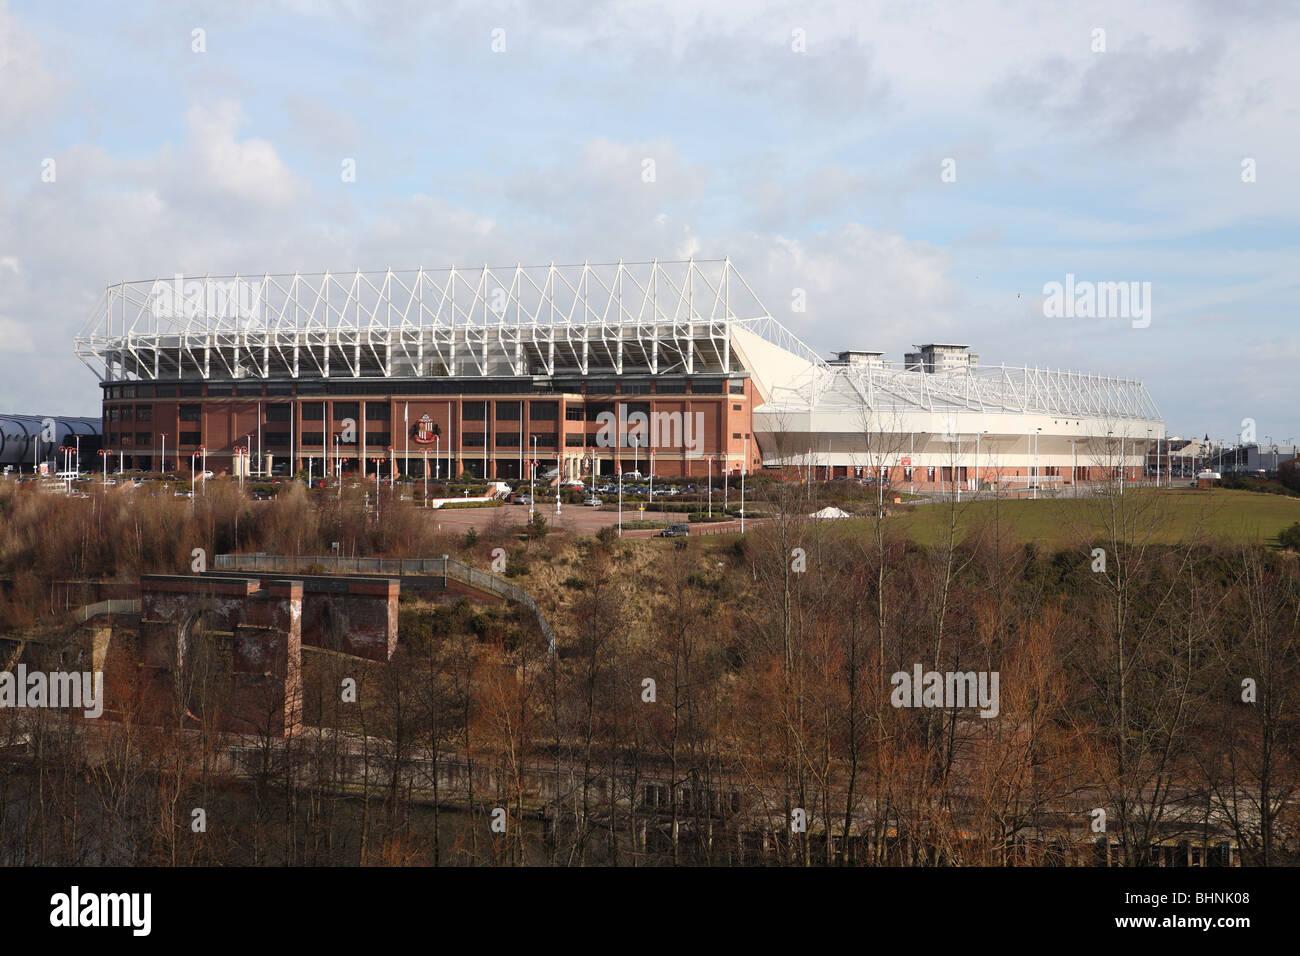 The Stadium of Light, home of Sunderland Association Football Club, Sunderland, England - Stock Image